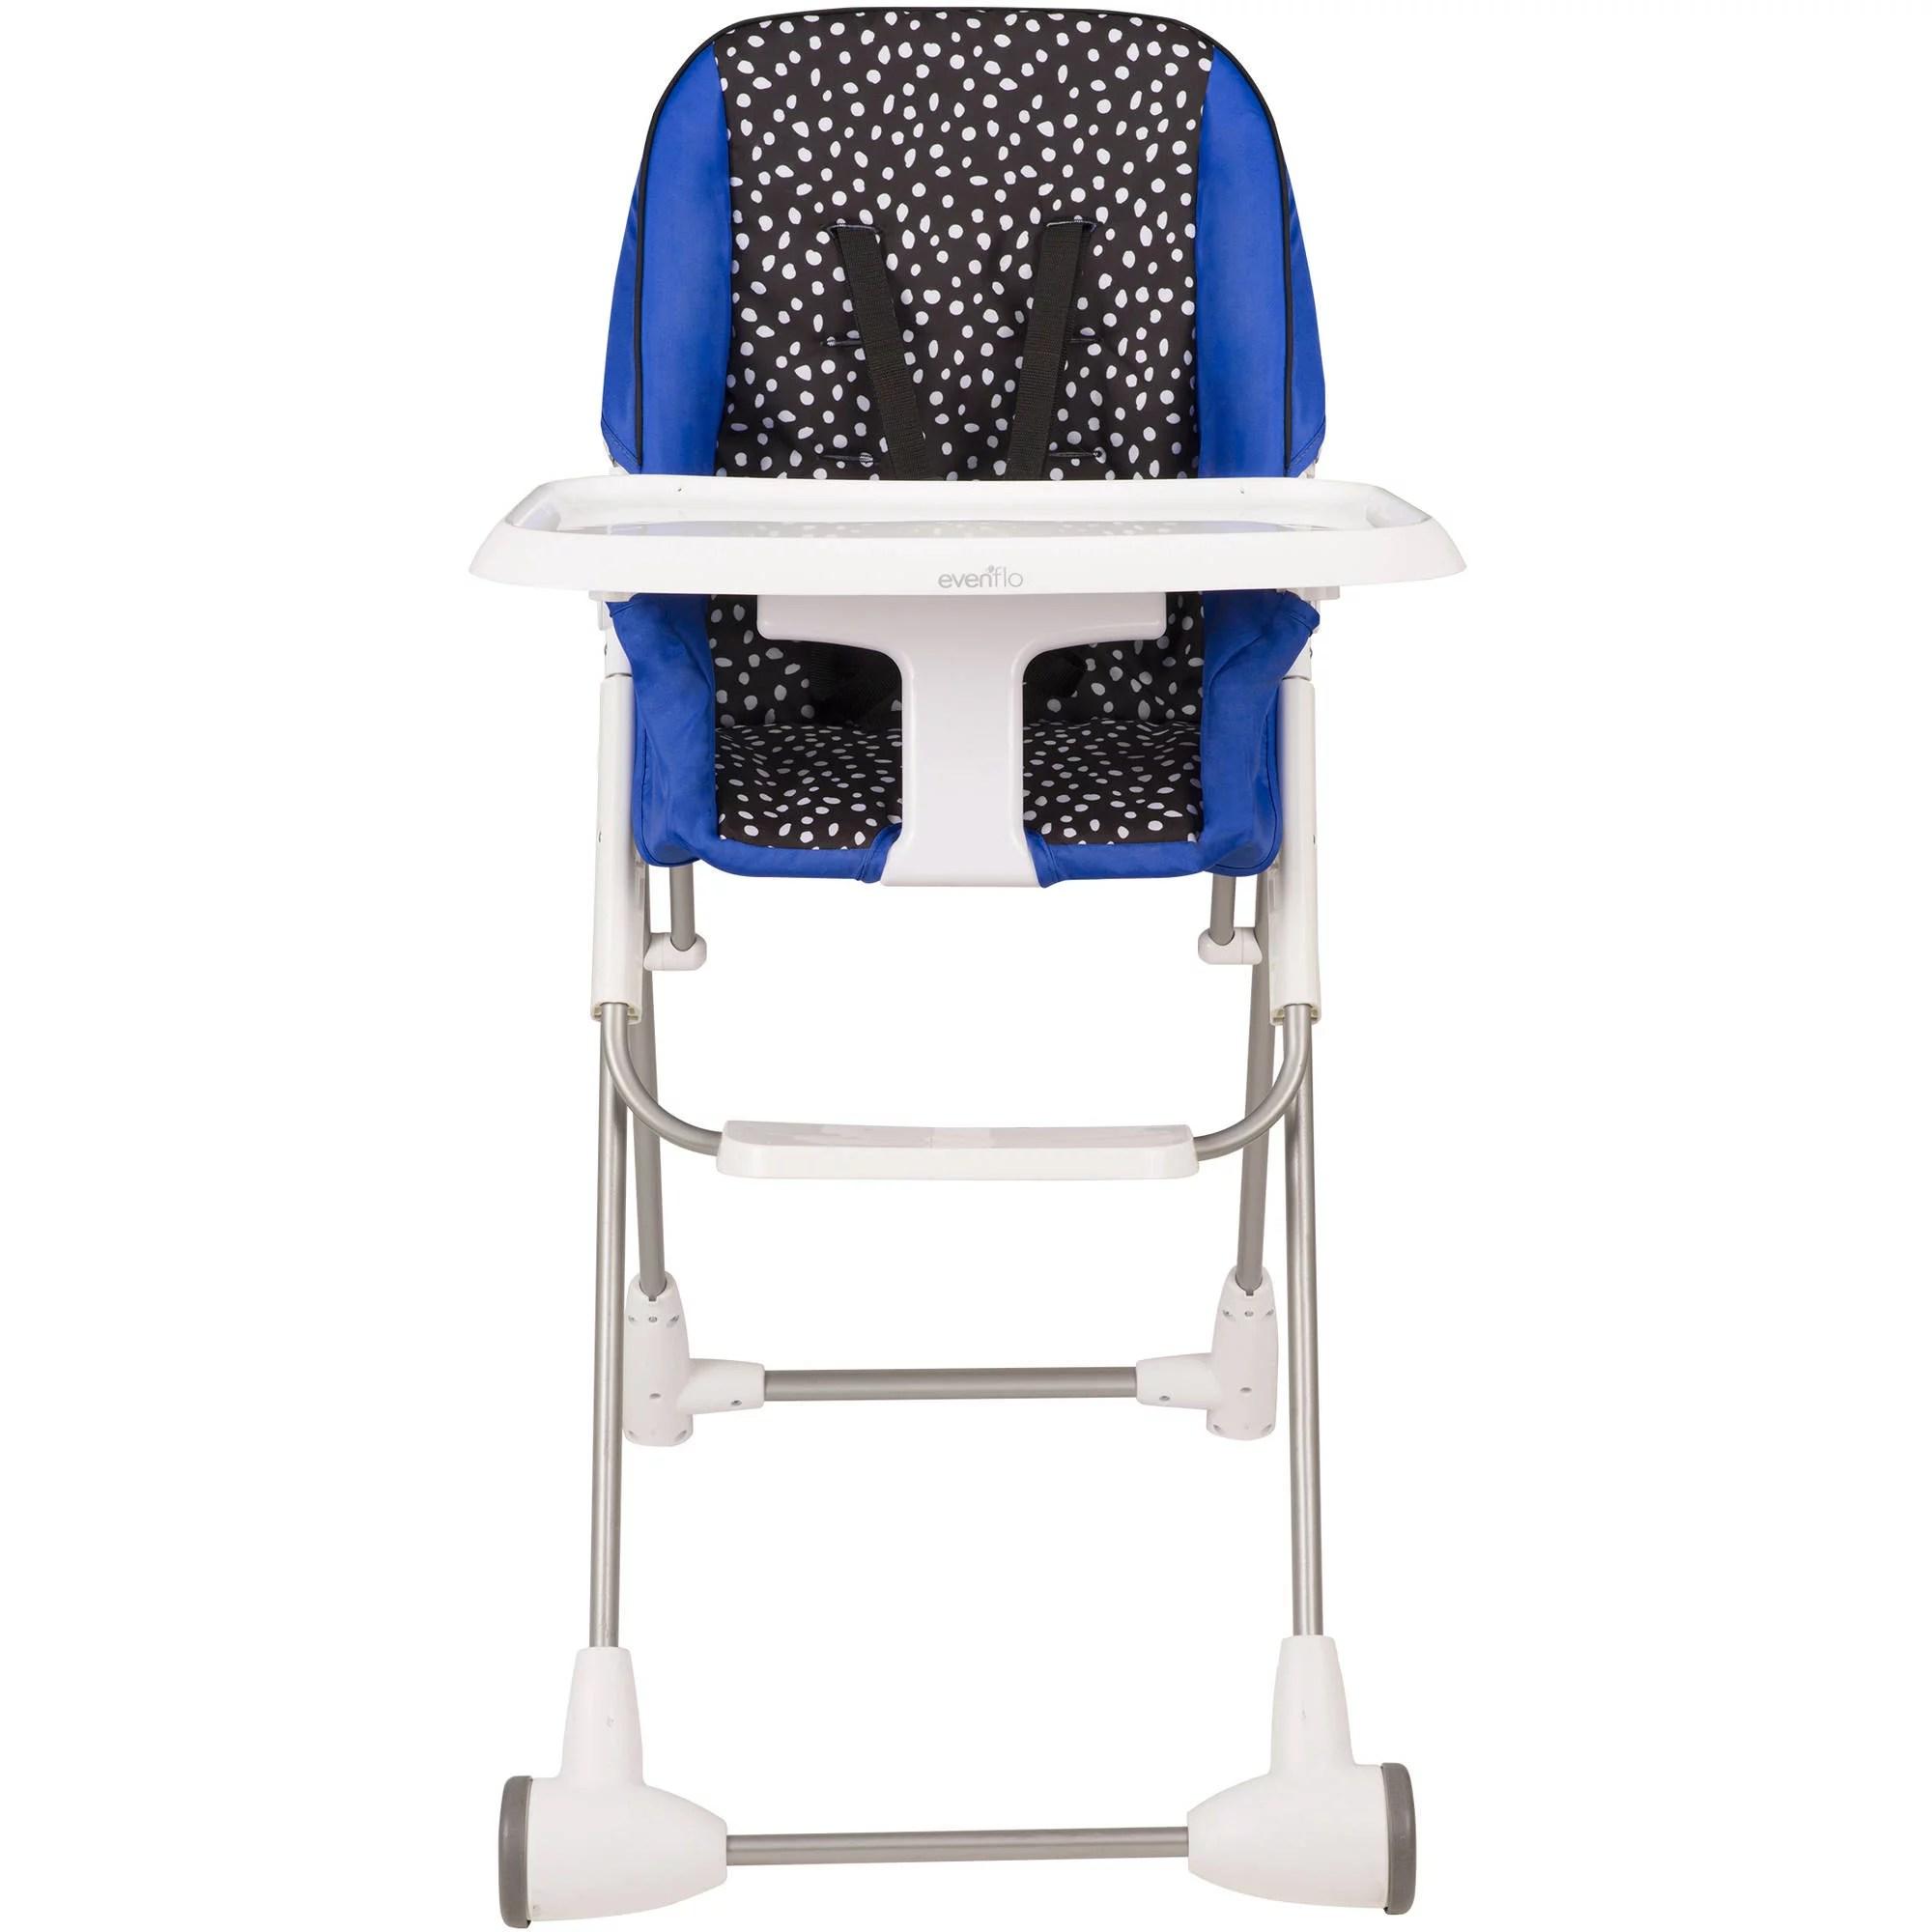 evenflo high chair easy fold recall gci accessories symmetry flat daphne walmart com